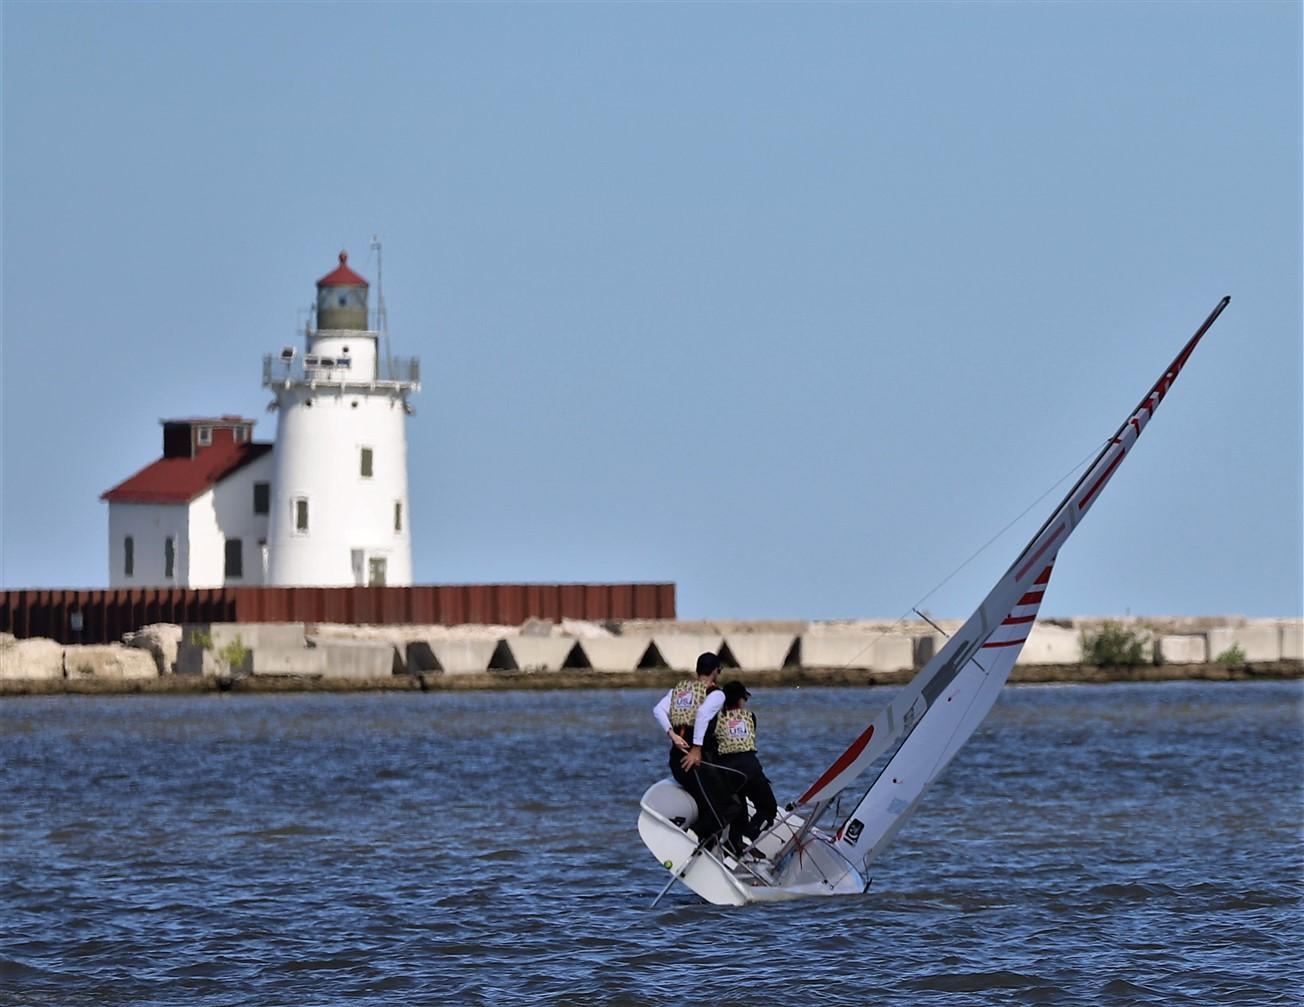 2018 09 29 86 Cleveland US Sailing Championships.jpg